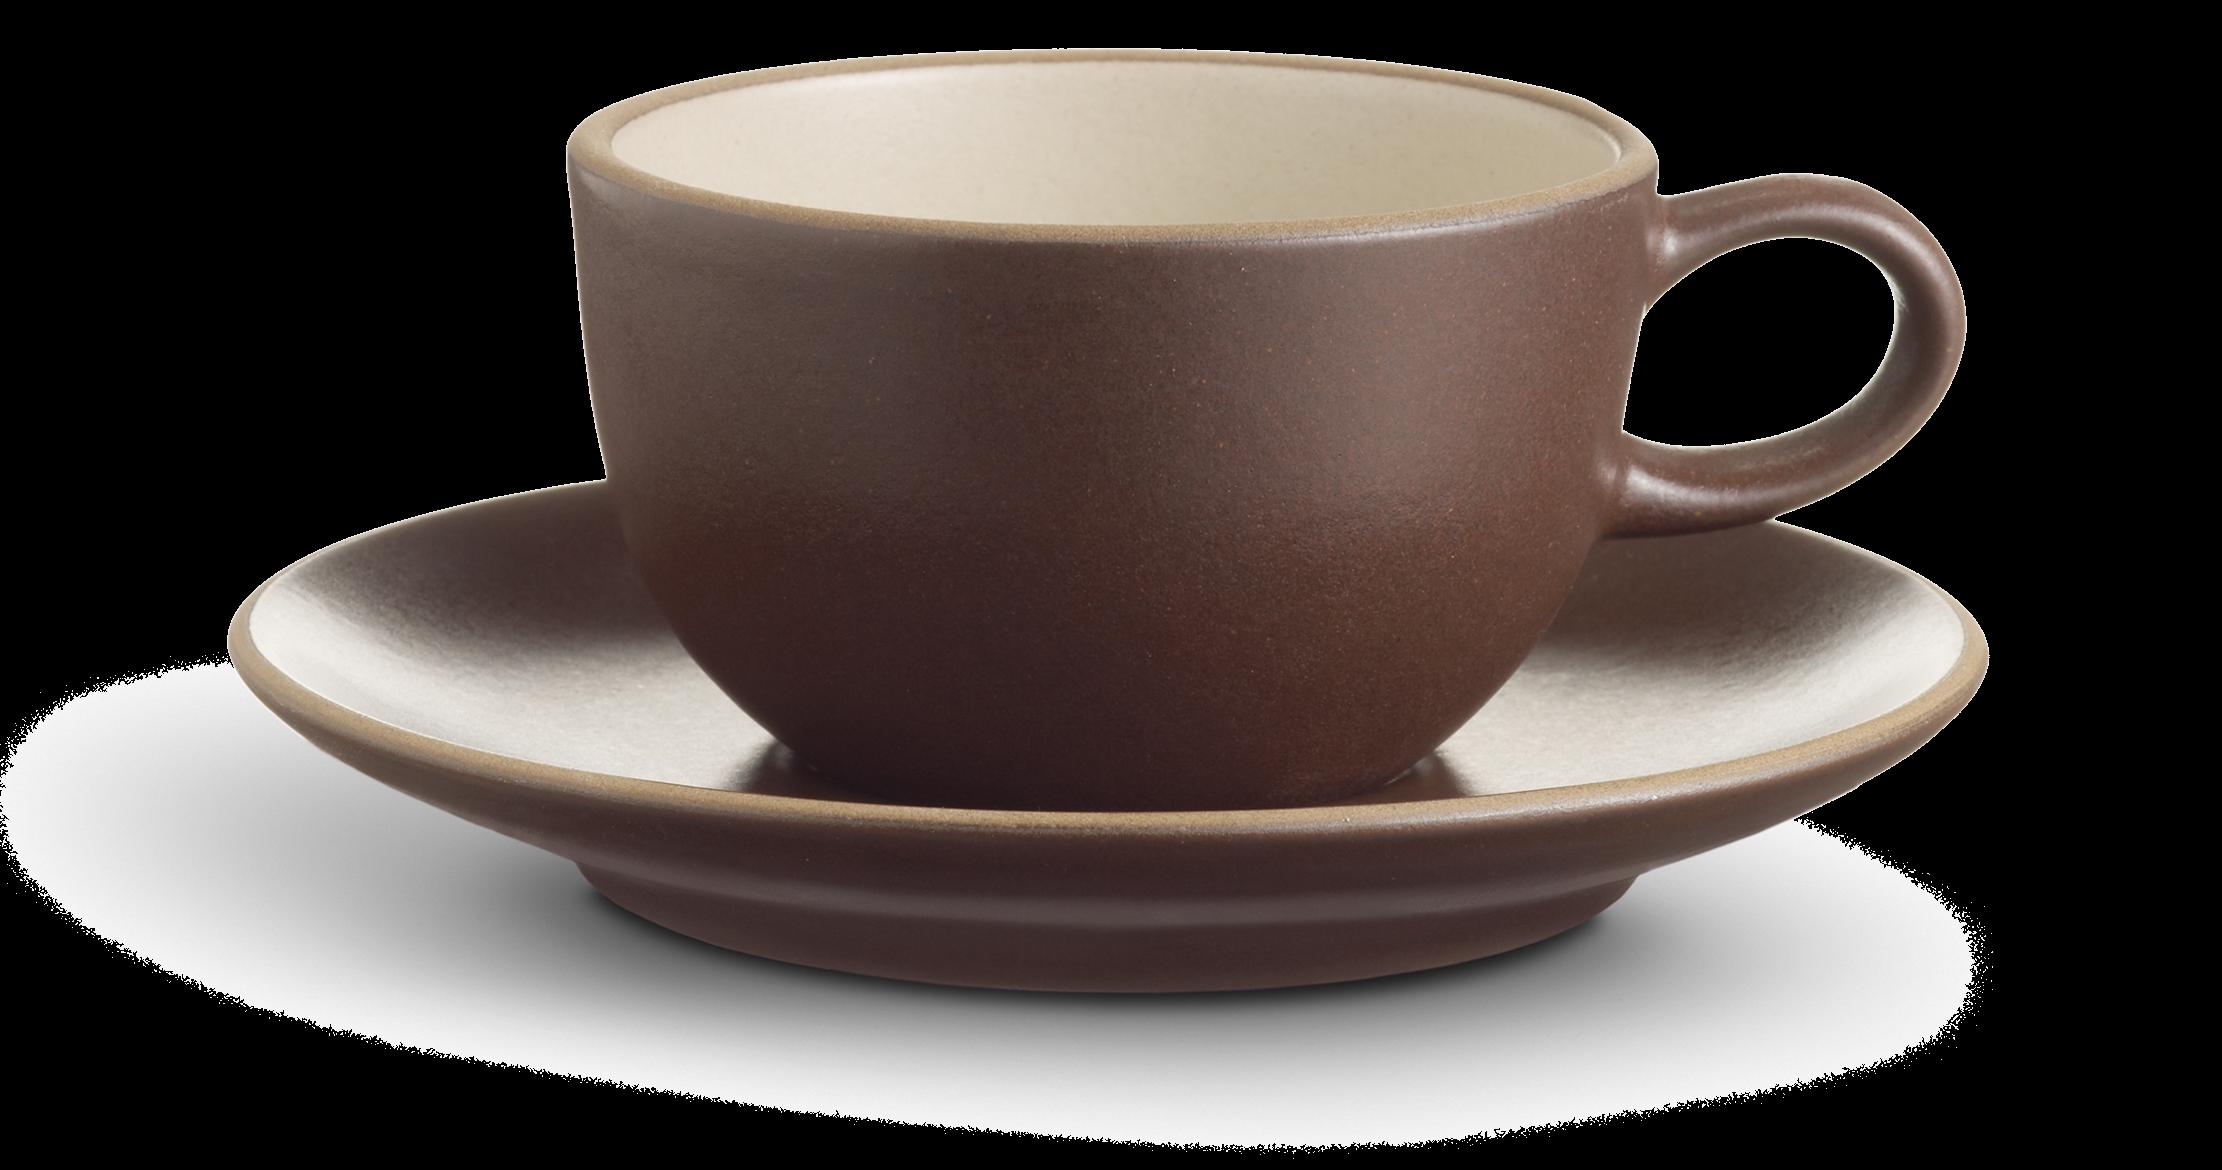 Tea clipart teaset. Cup png hd transparent